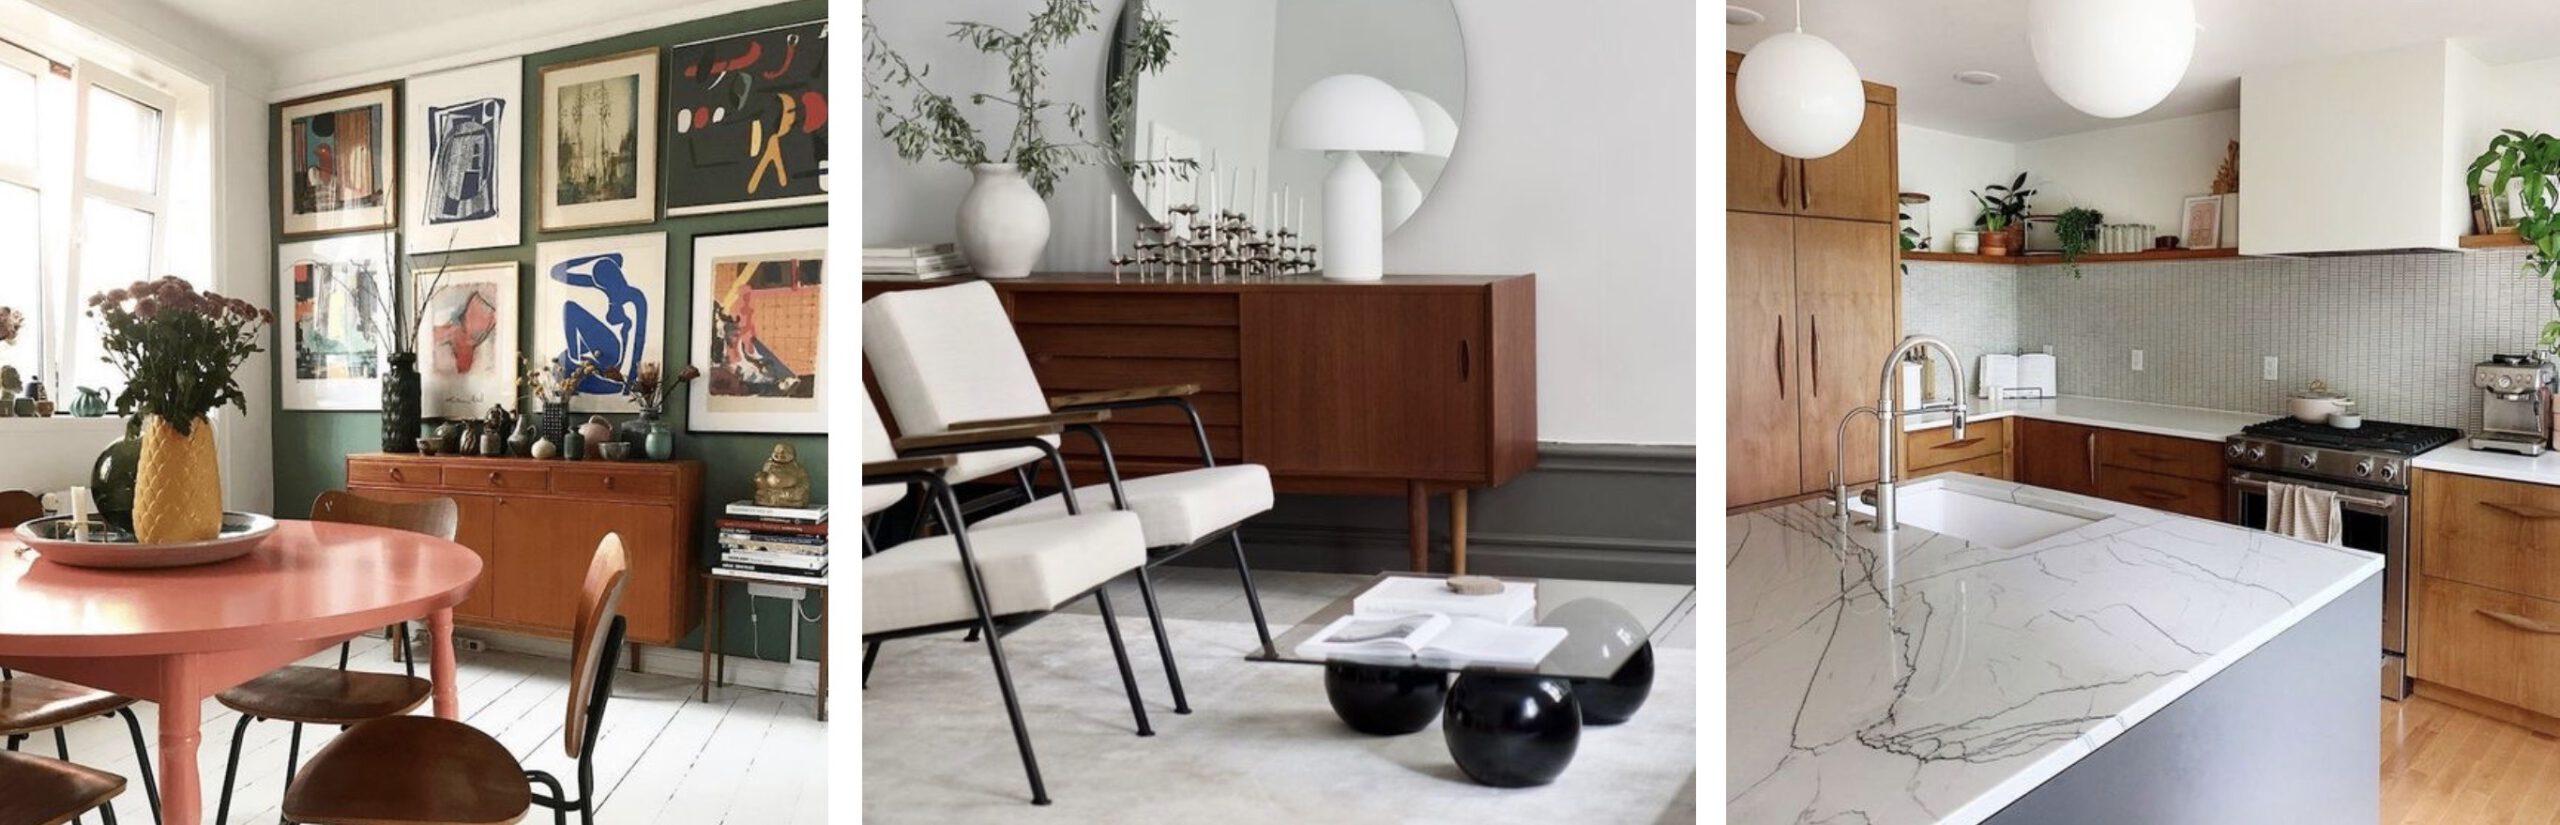 interieurstijl mid century modern vintage